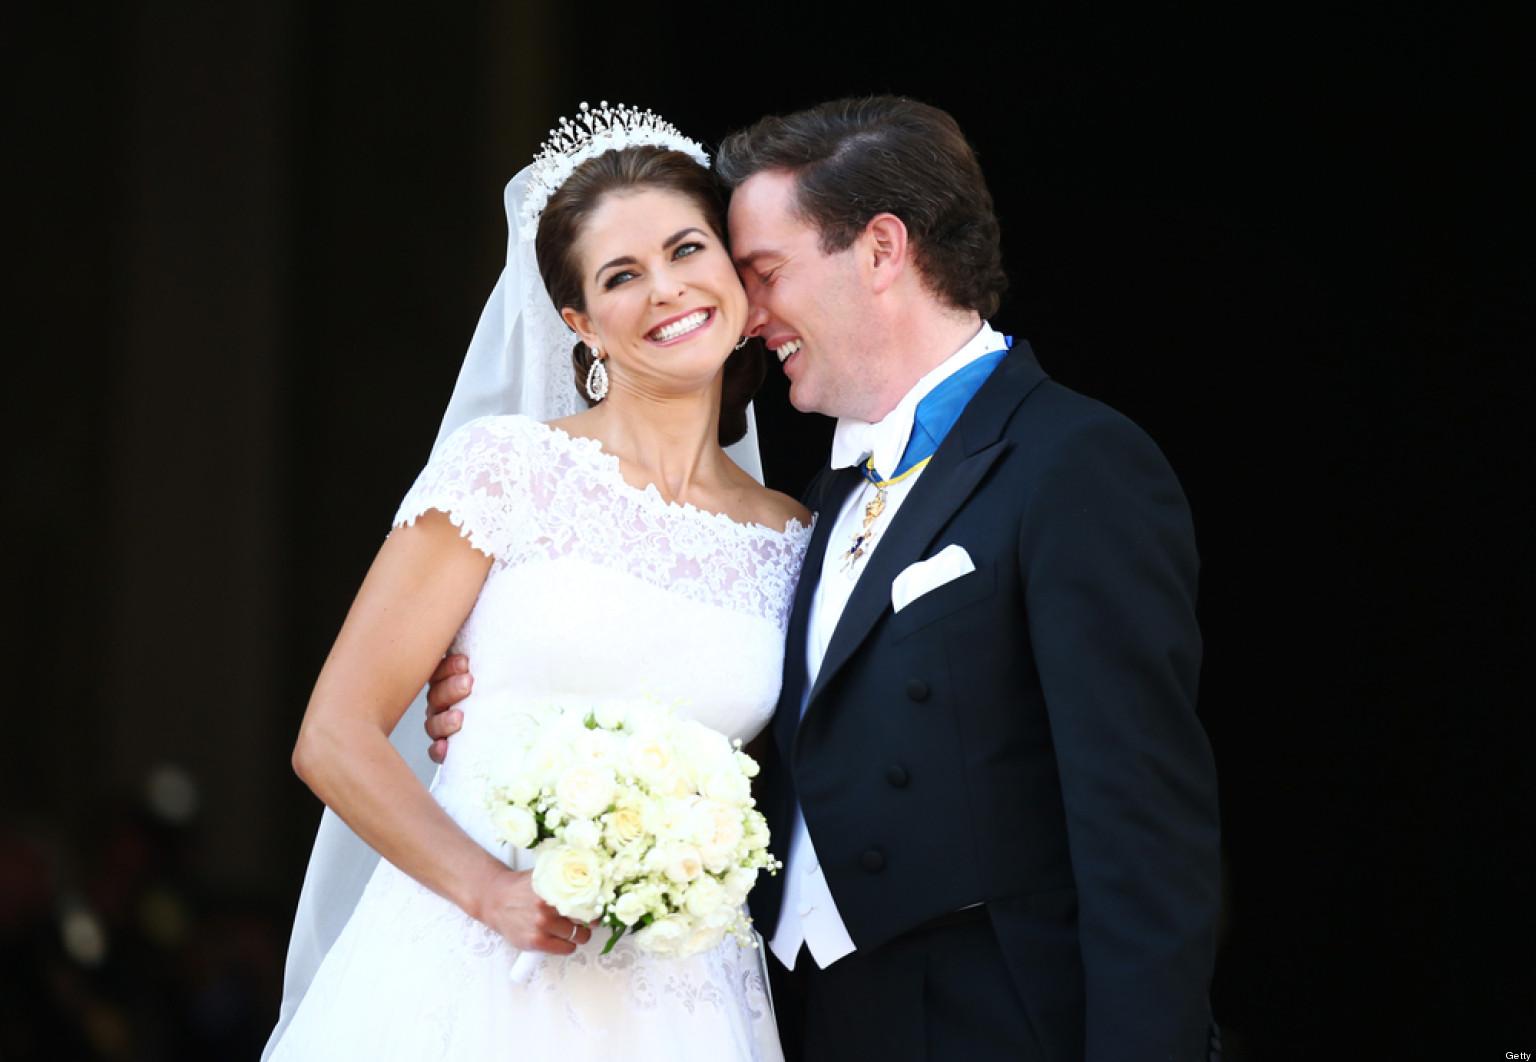 Свадьба шведской принцессы мадлен фото